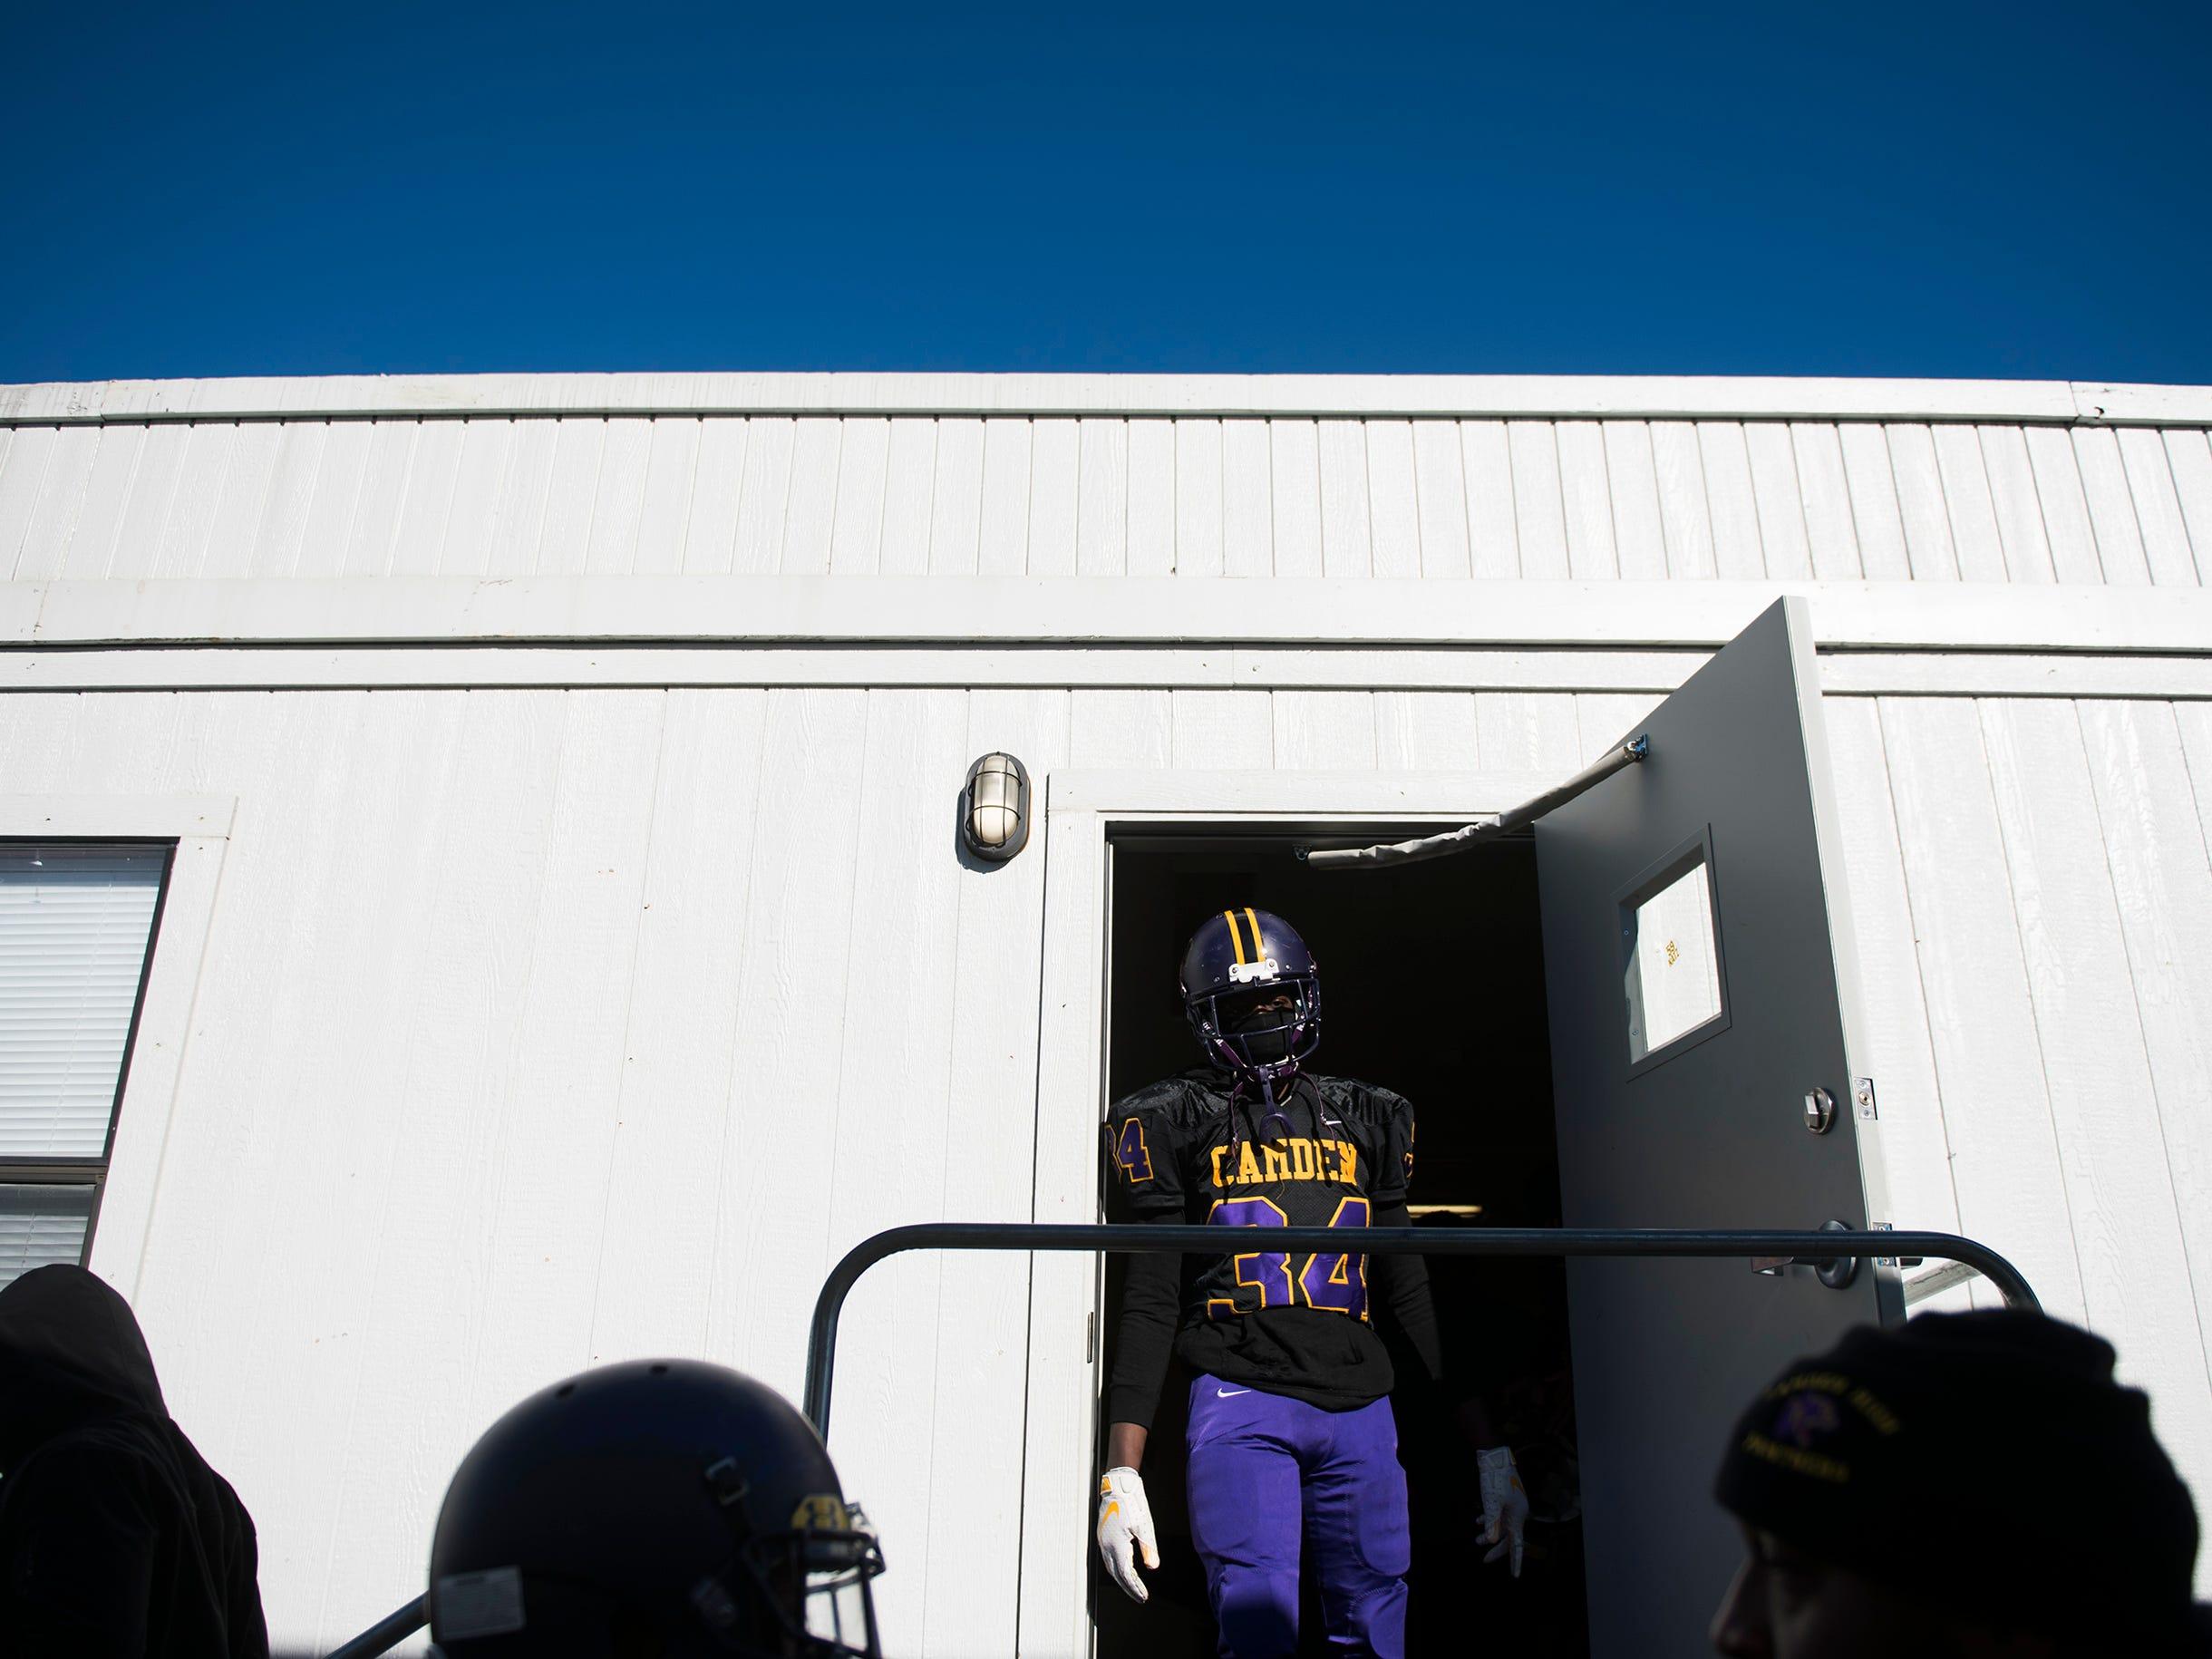 Camden's Zyeer Blount (34) exits the locker room to begin the second half during an annual Camden-Woodrow Wilson Thanksgiving game Thursday, Nov. 22, 2018 in Camden, N.J. Camden won 39-28.